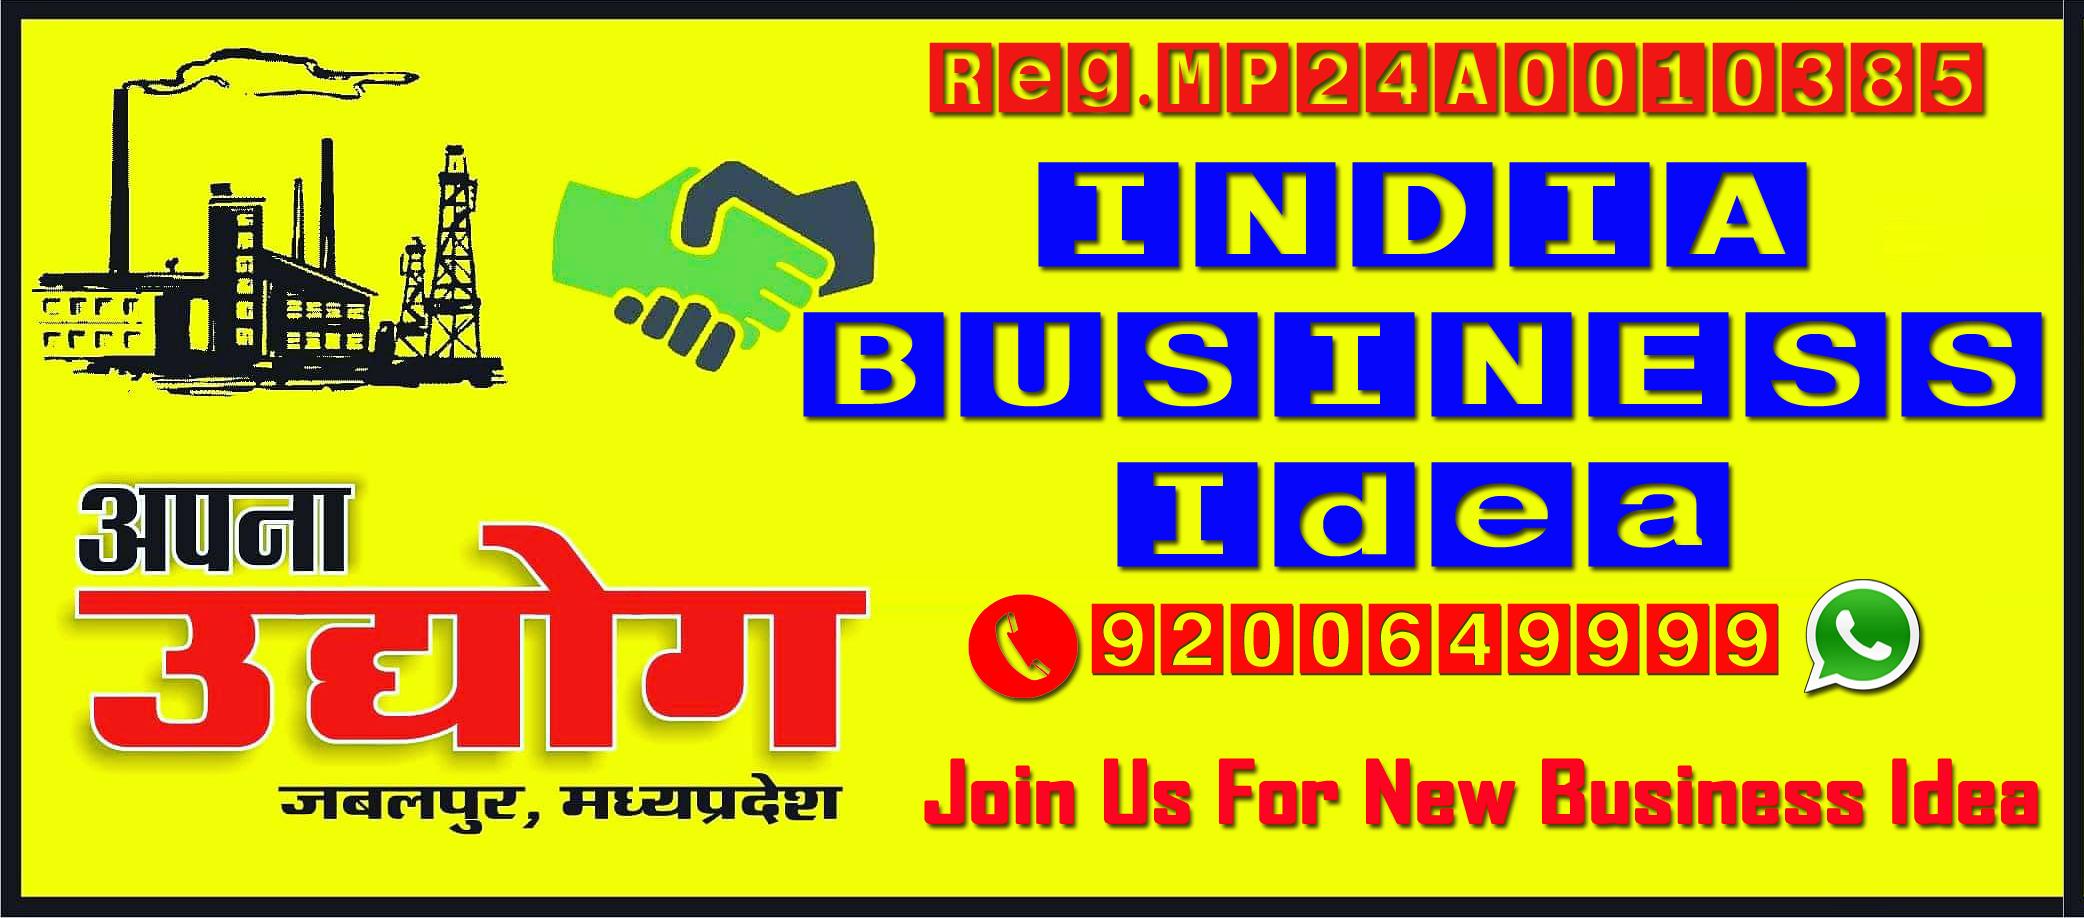 Business Ideas type